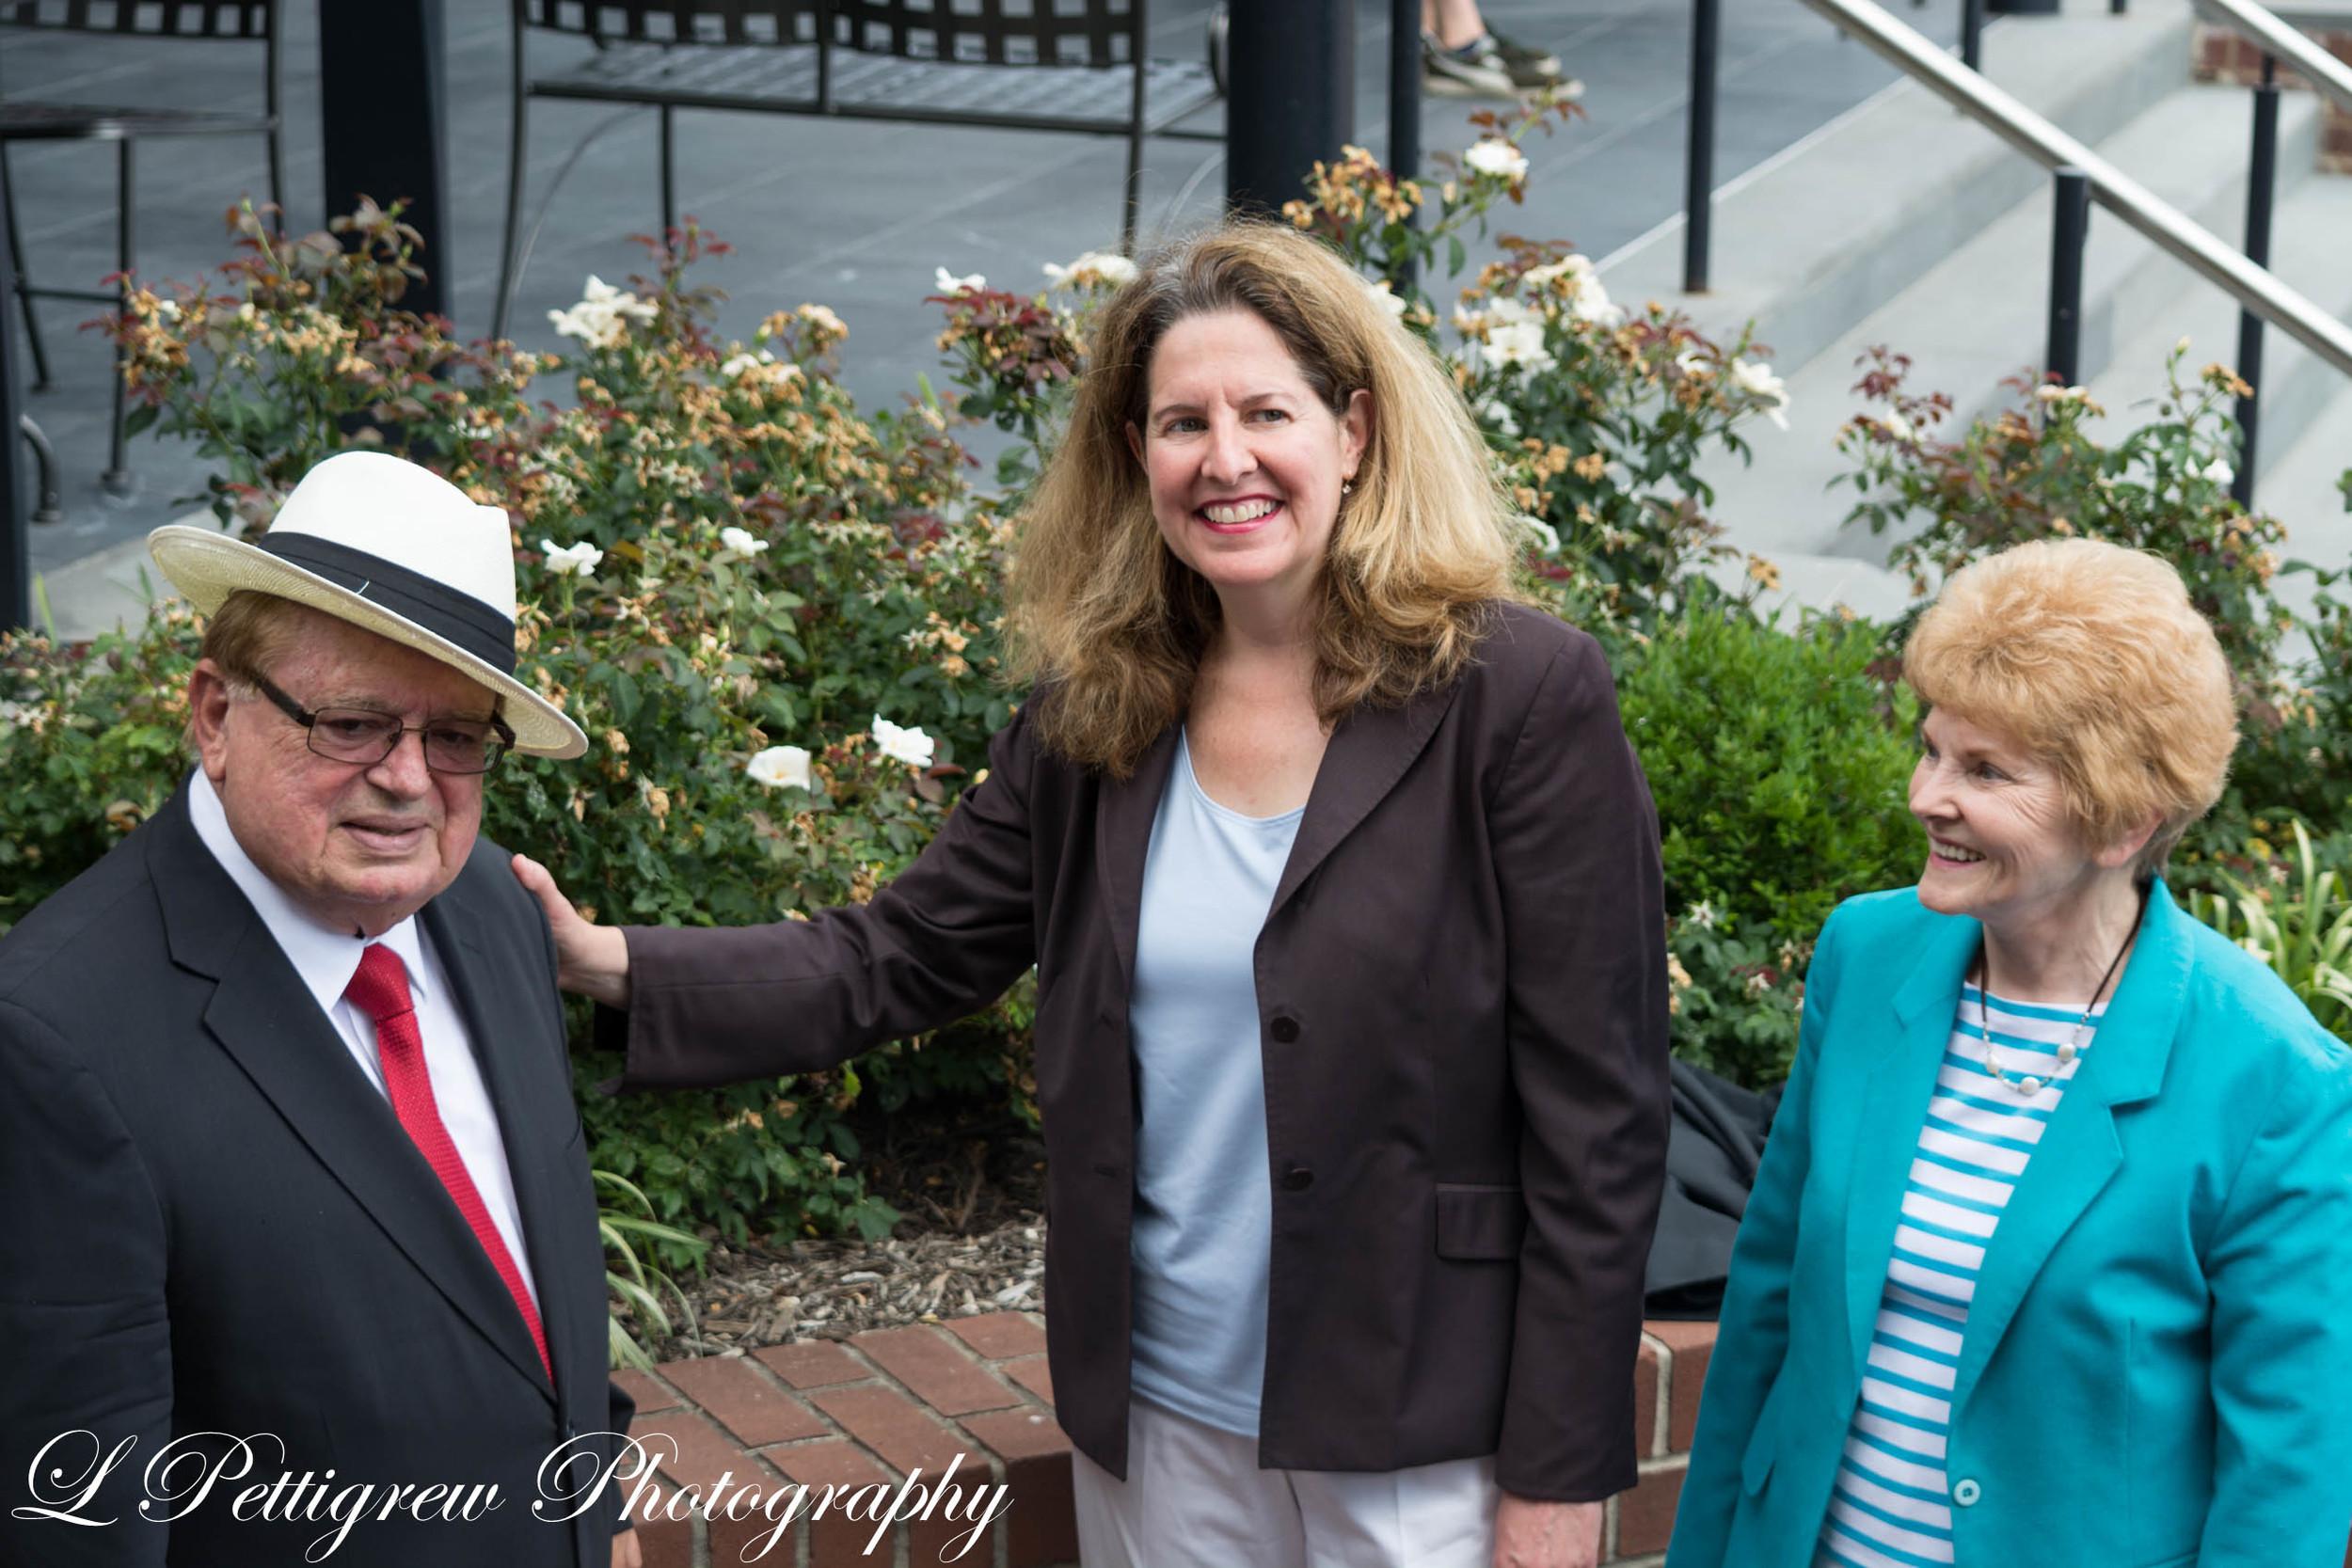 Engin Artemel, Mayor Silberberg, and Del Pepper